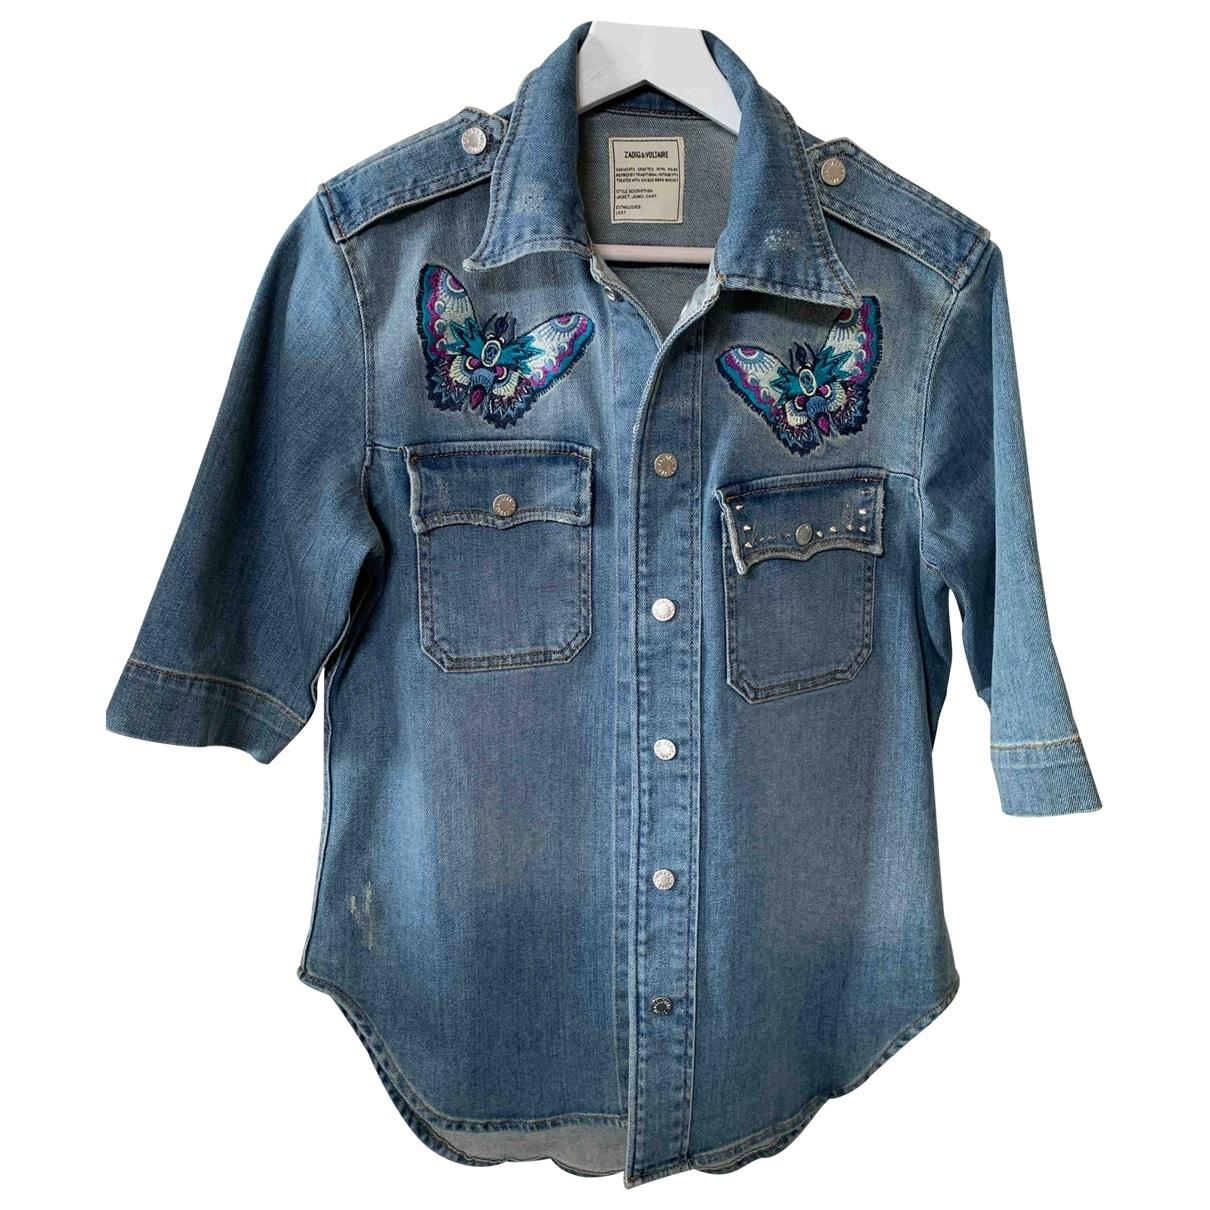 Zadig & Voltaire \N Blue Denim - Jeans  top for Women 38 FR